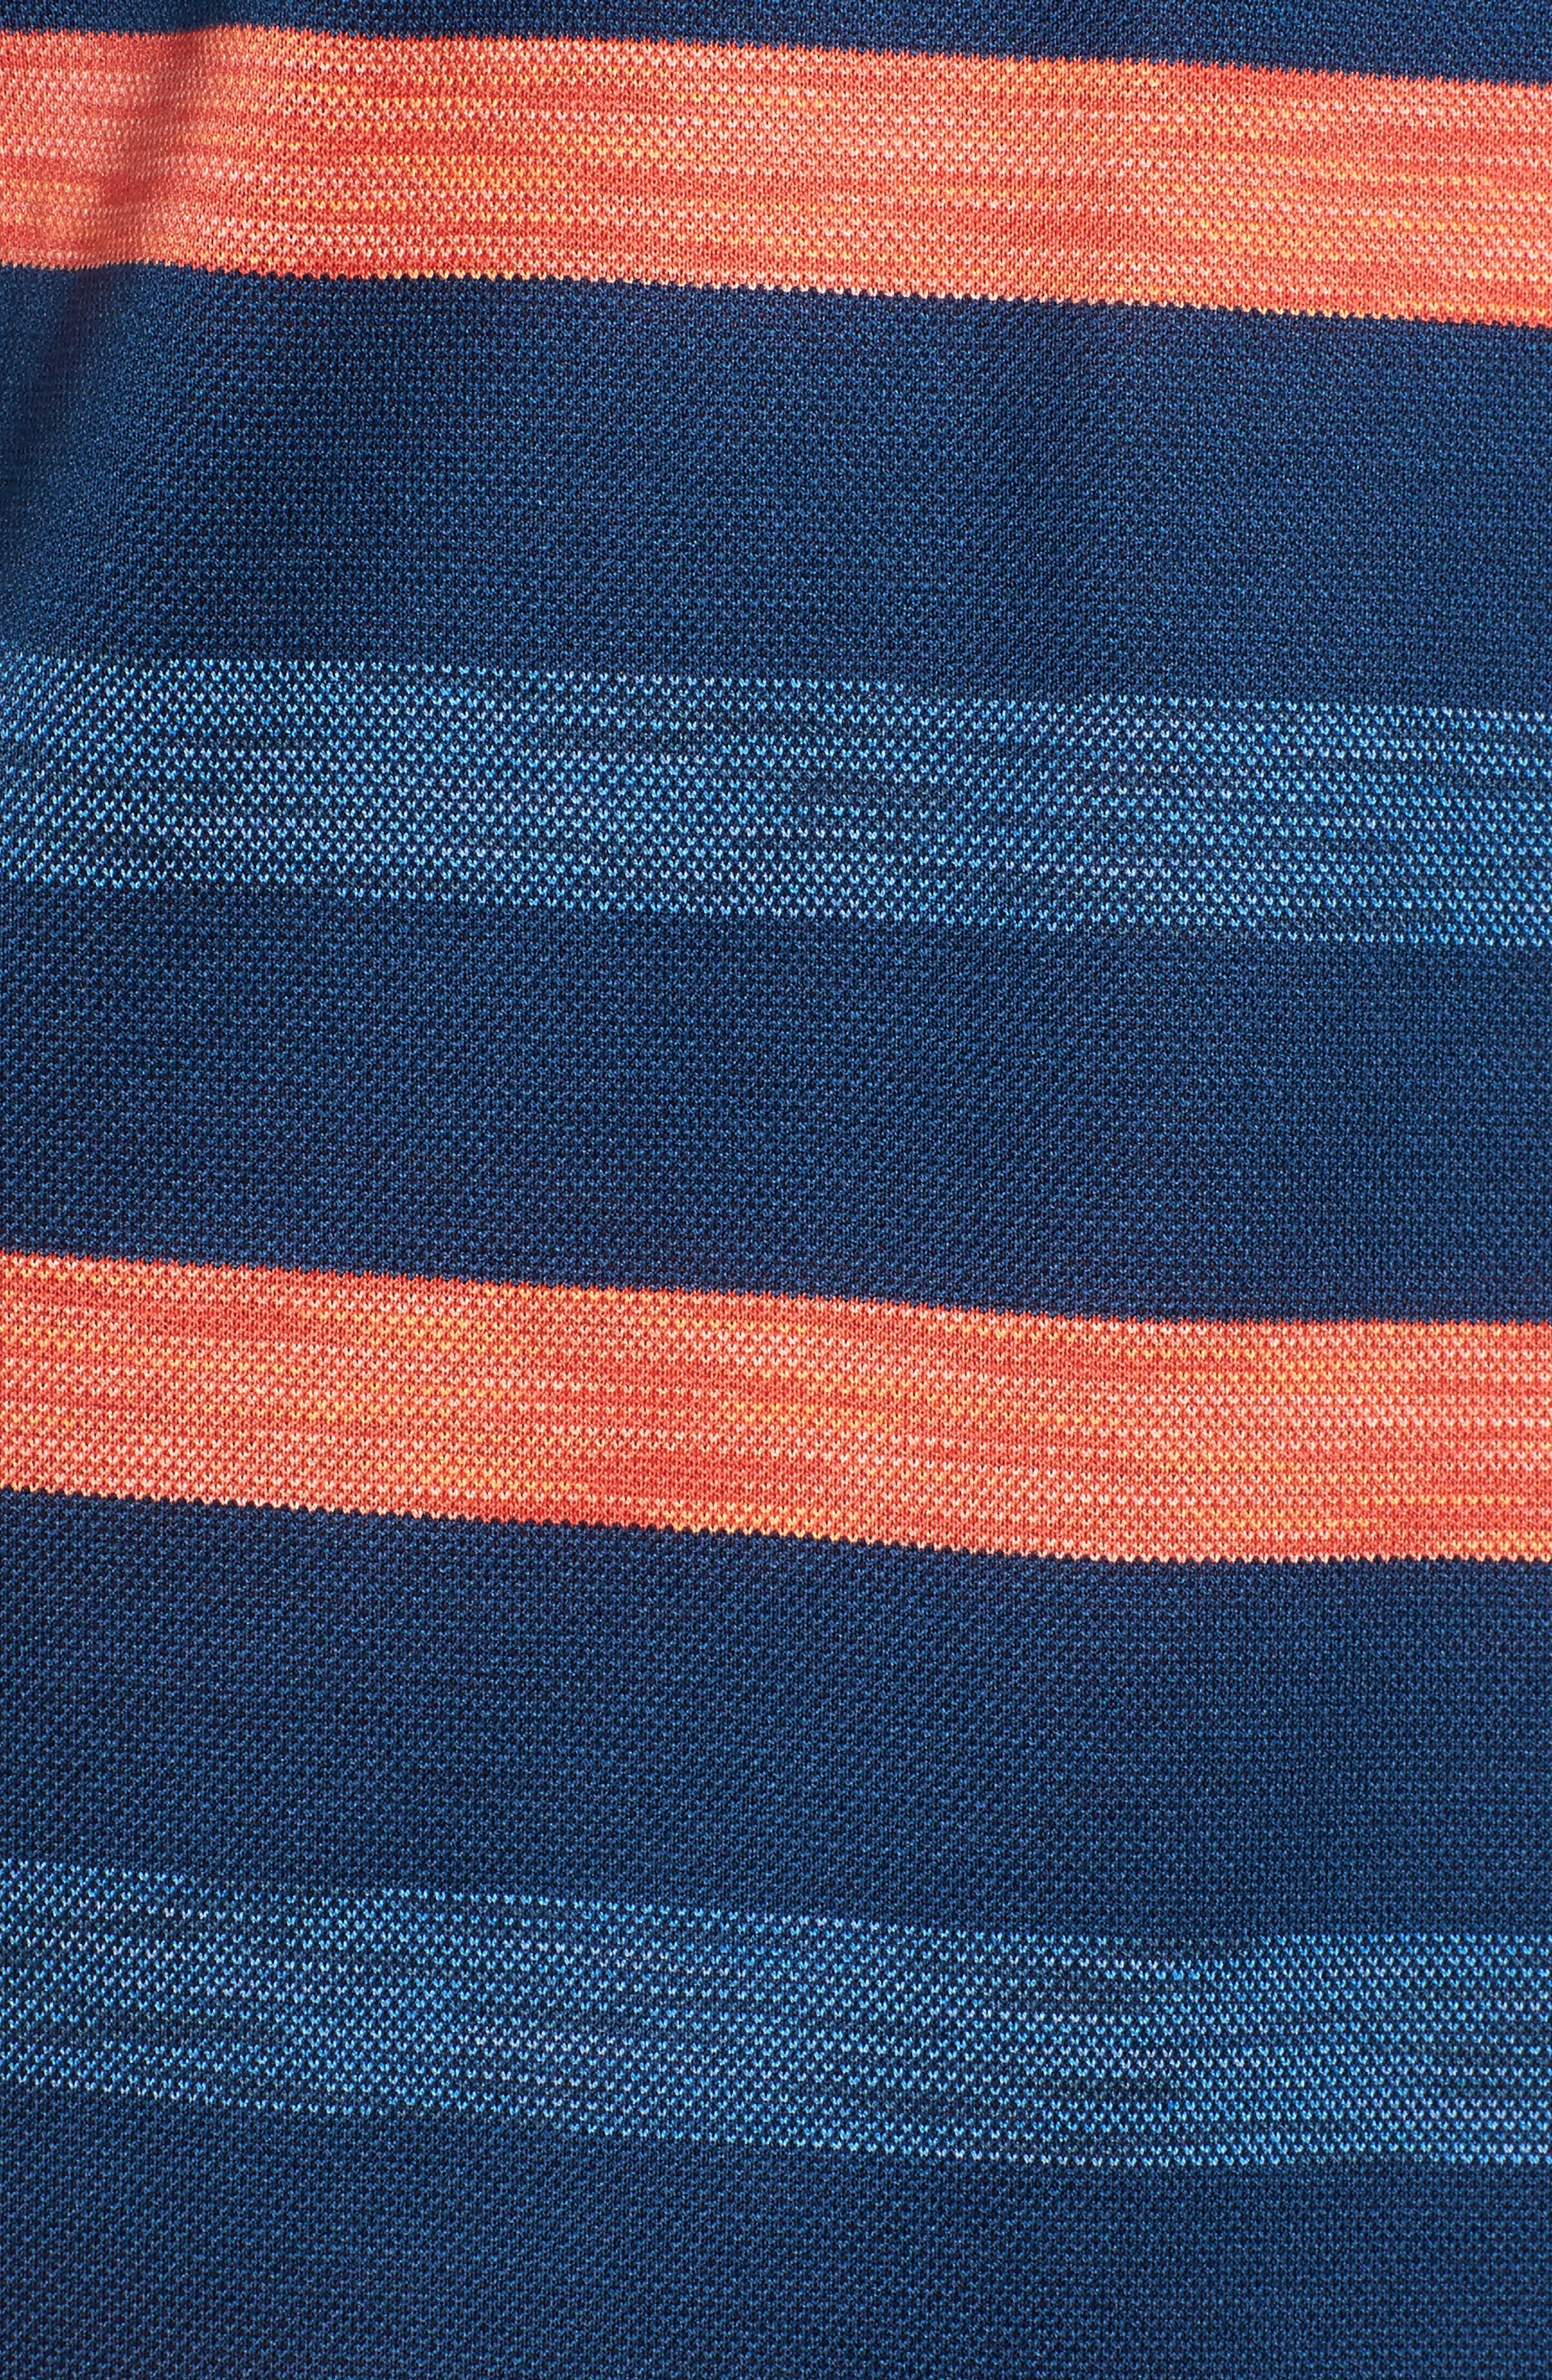 Paul&Shark Stripe Piqué Polo,                             Alternate thumbnail 5, color,                             Blue/ Orange